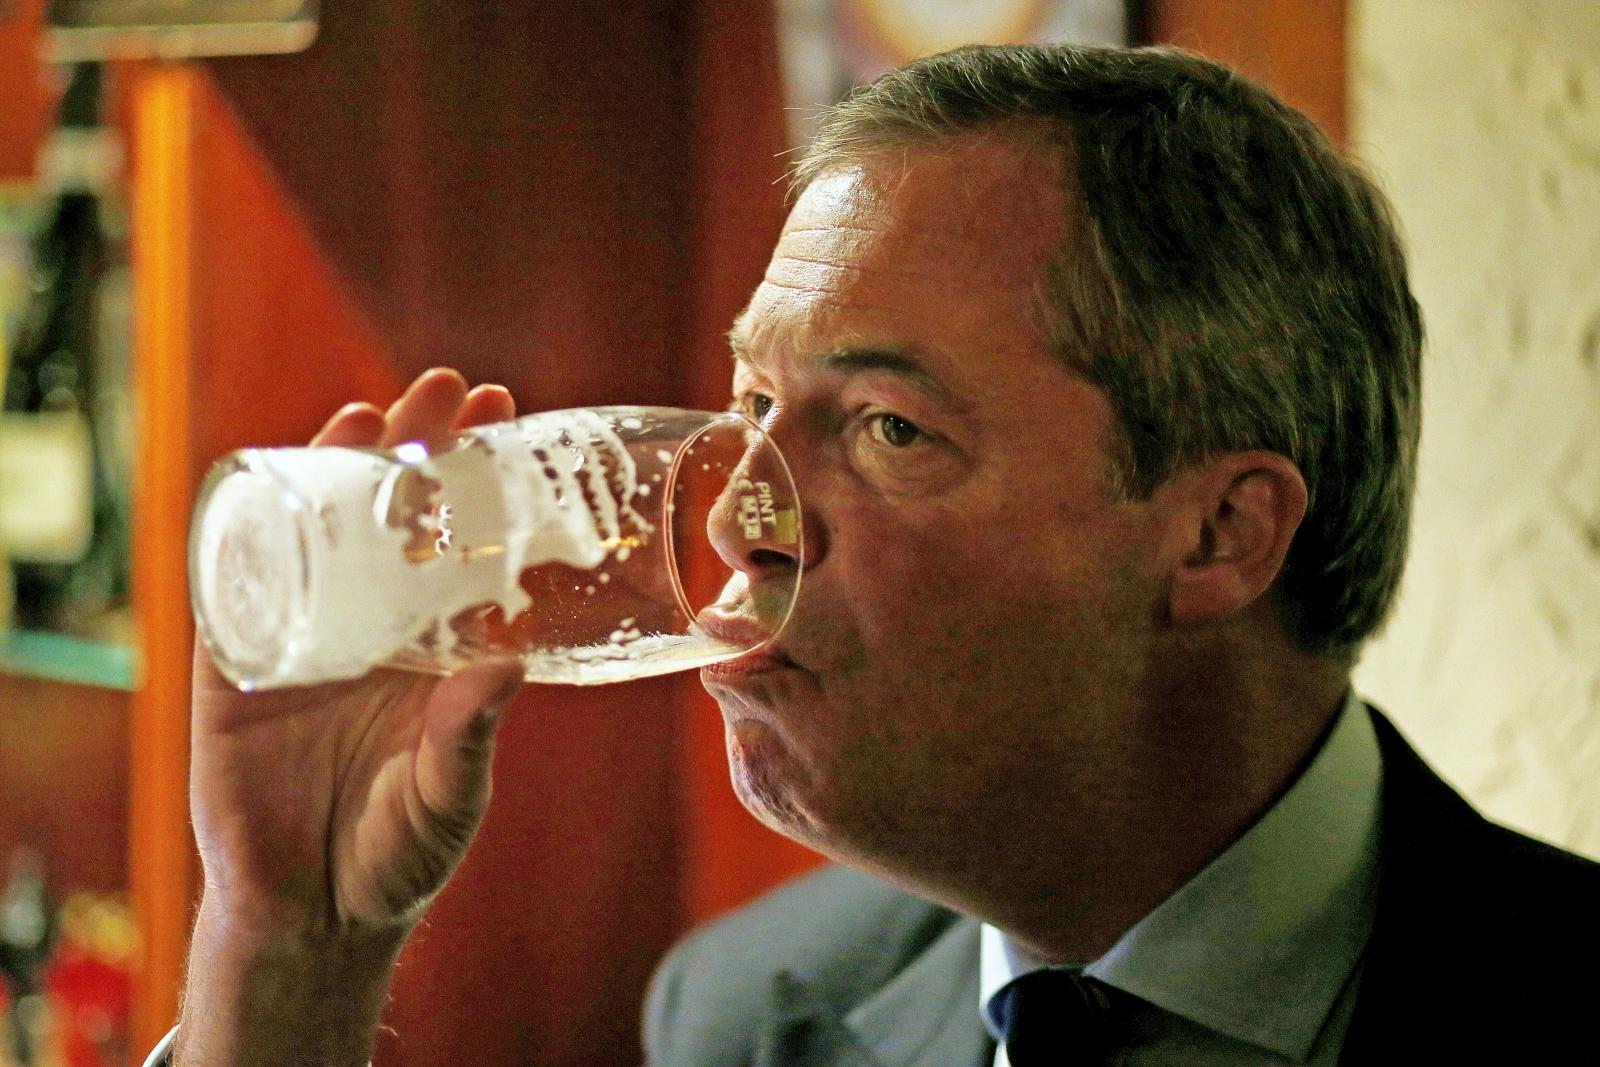 Nigel Farage: Ukip would scrap racism laws